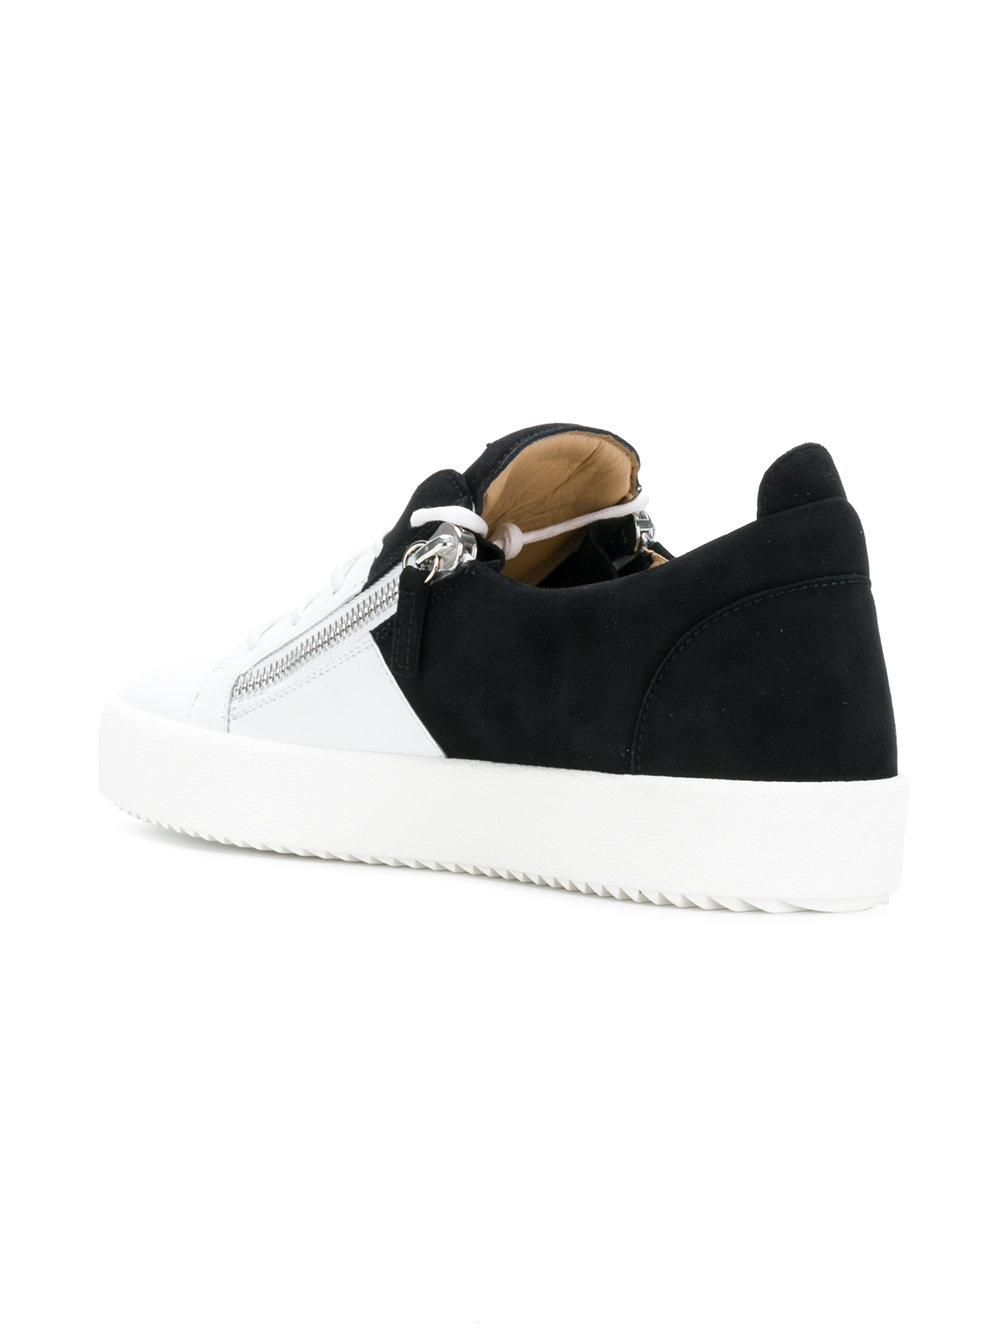 d85099e1da7 Giuseppe Zanotti - White Bicolour May London Sneakers for Men - Lyst. View  fullscreen